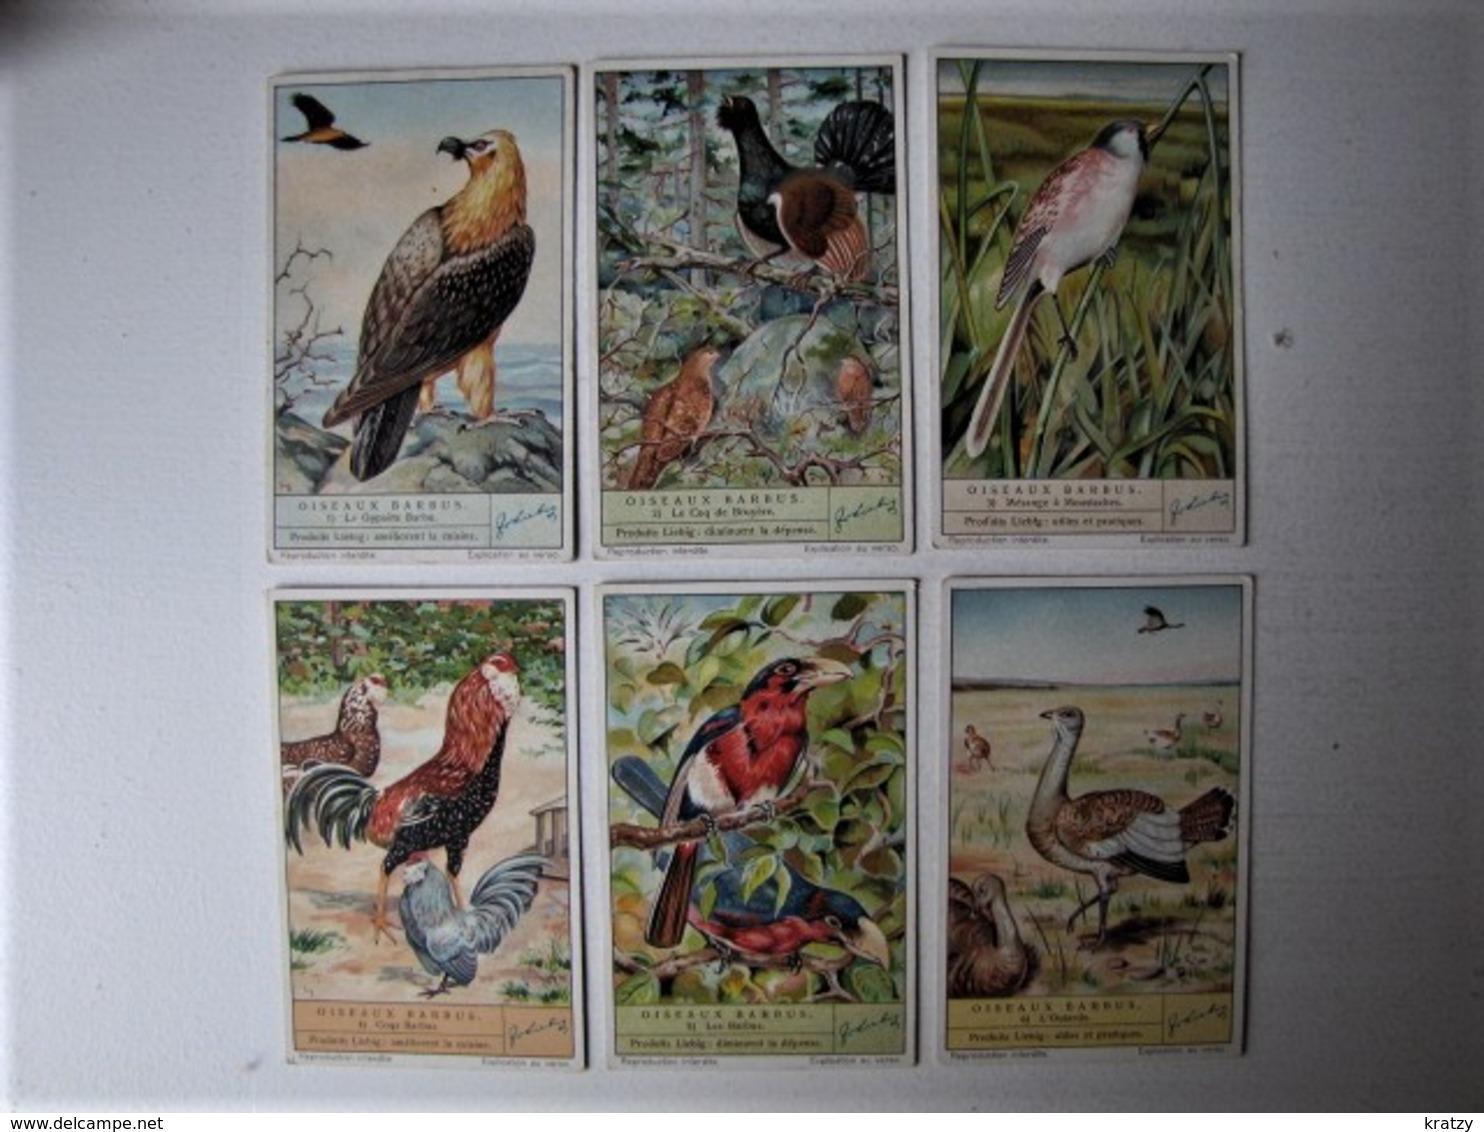 CHROMOS - LIEBIG - Oiseaux Barbus - Complet - Liebig